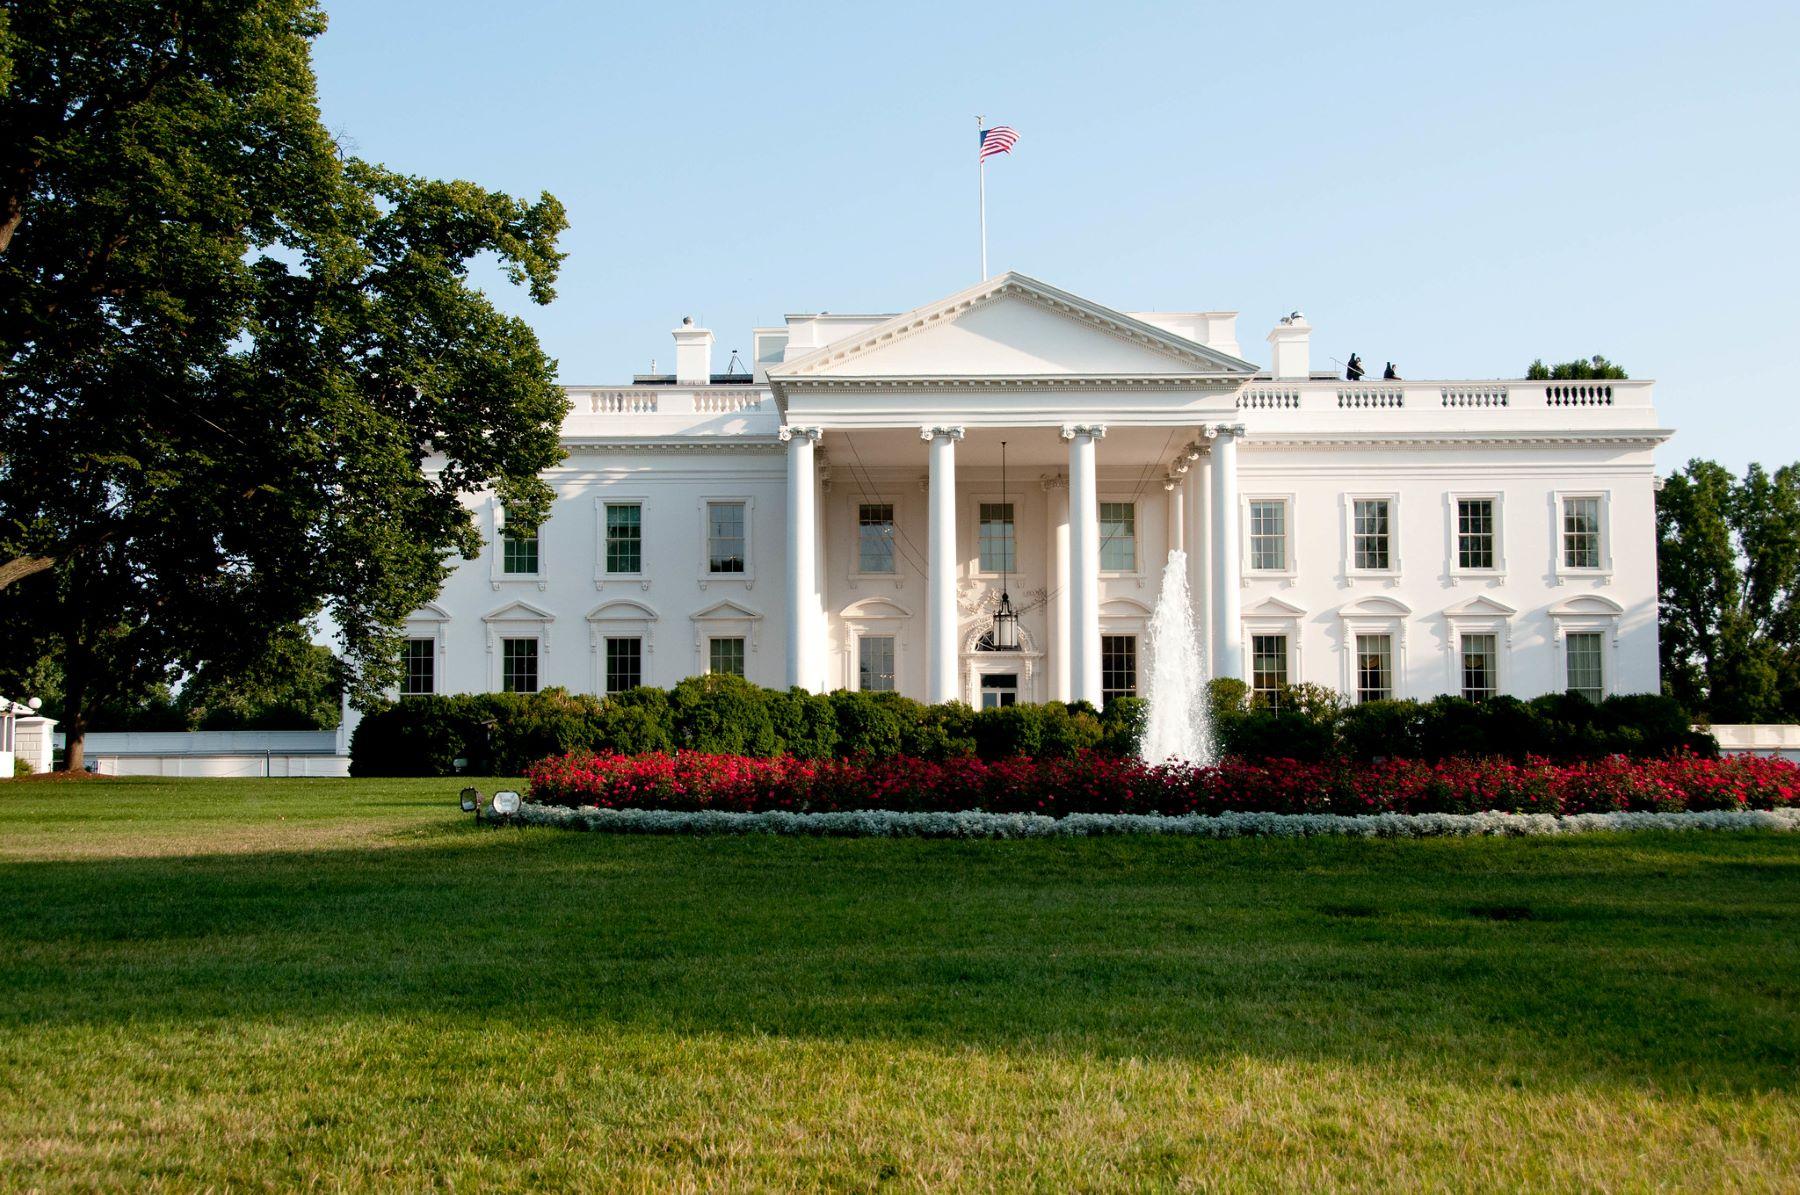 US Secretaries of Agriculture: A Brief Look at Their Legacies